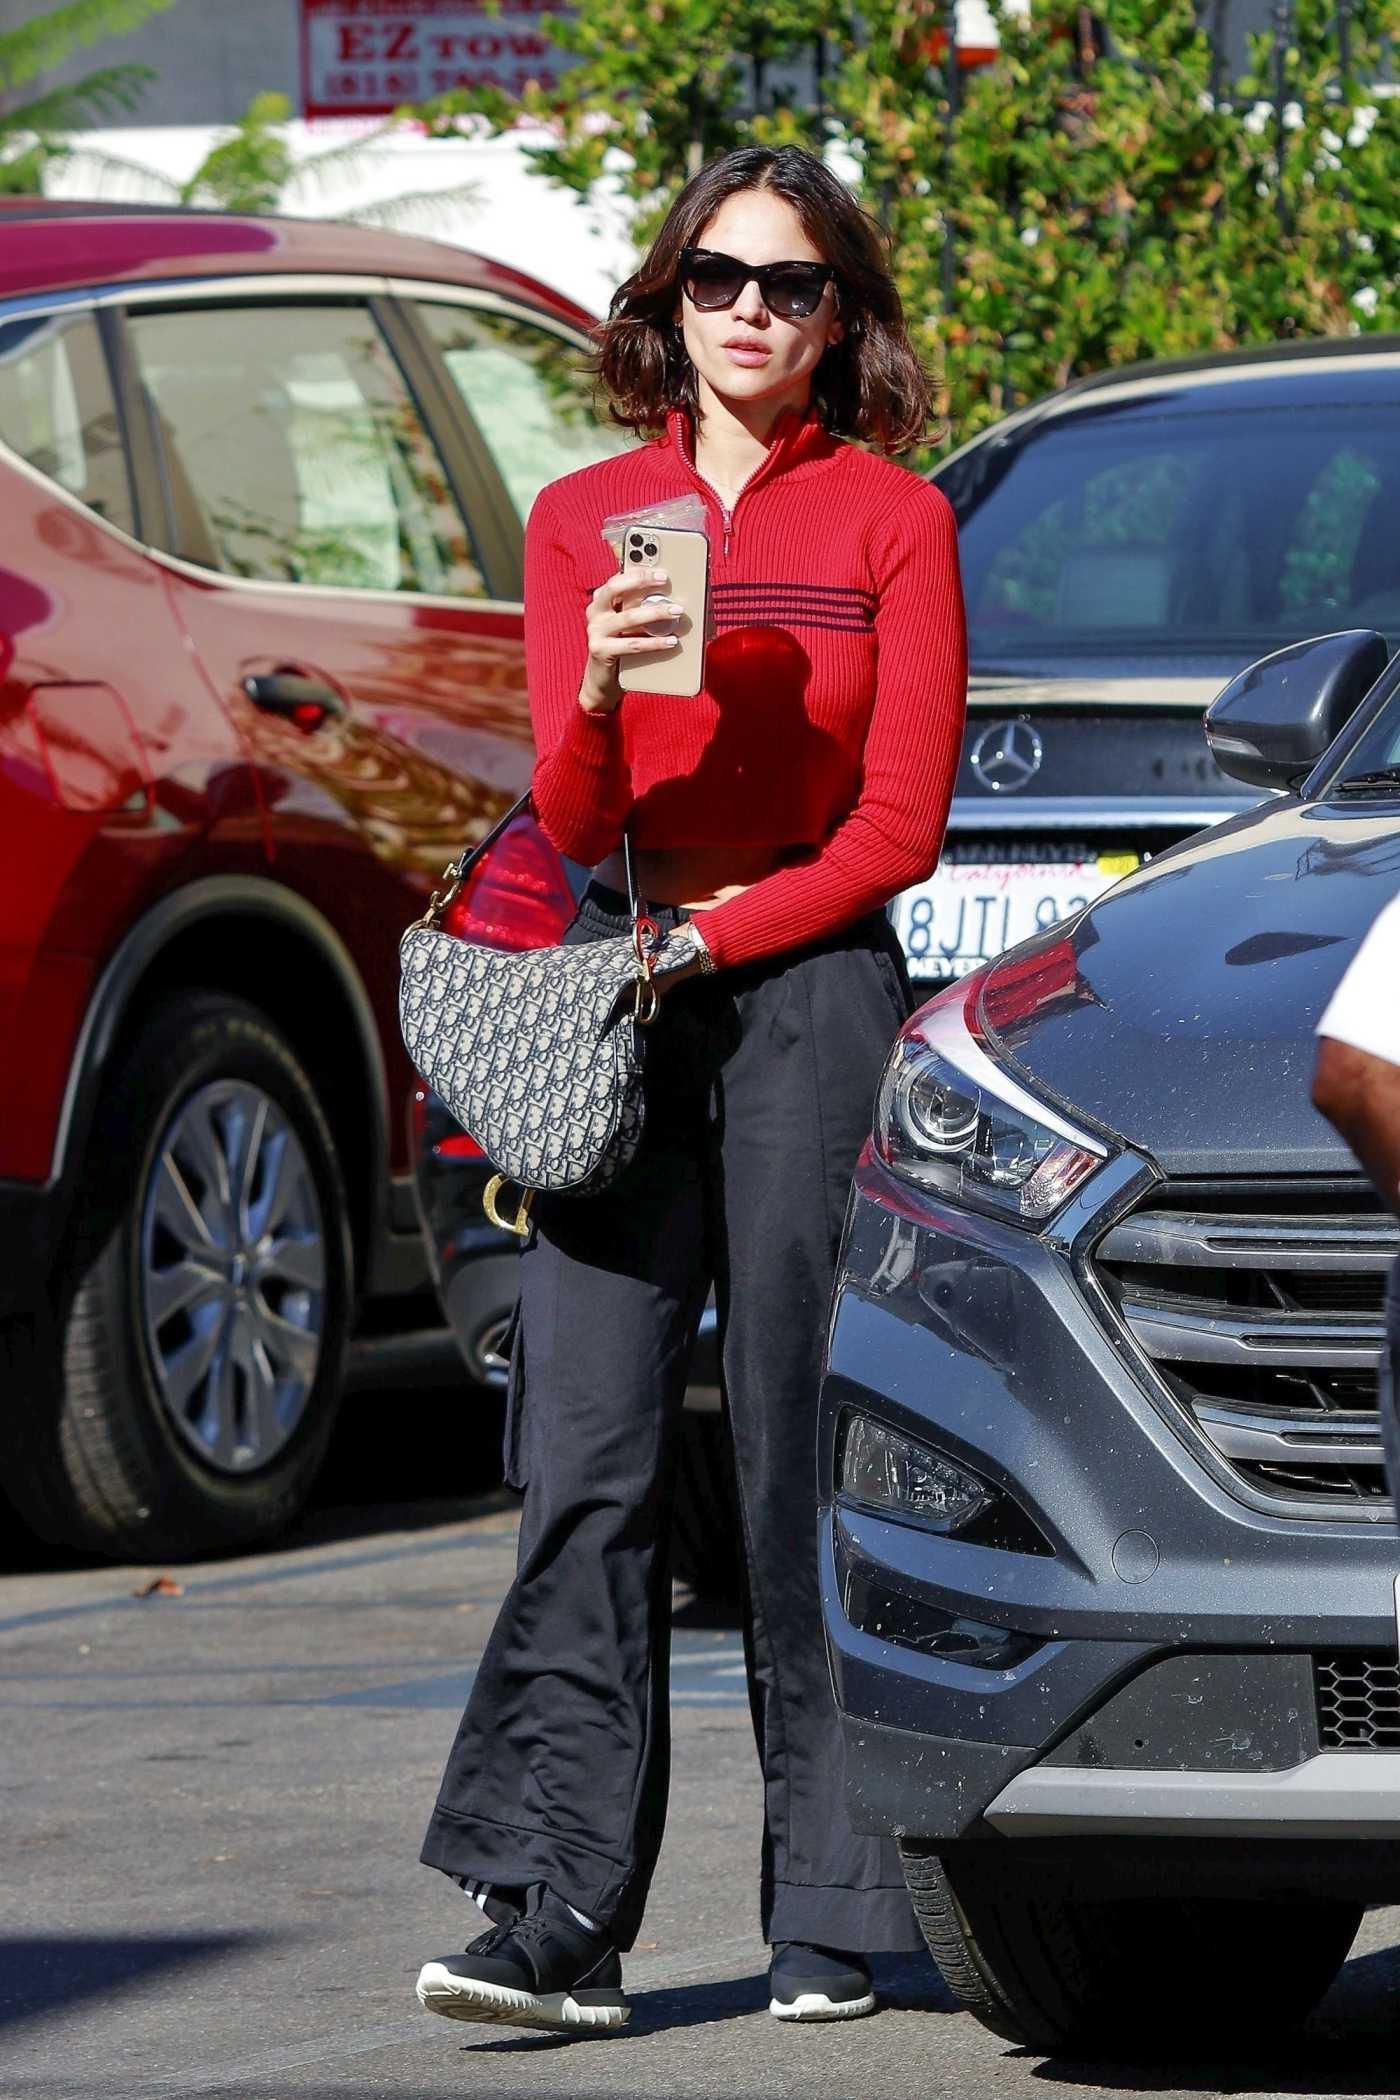 Eiza Gonzalez in a Red Sweater Was Seen Out in LA 11/22/2019